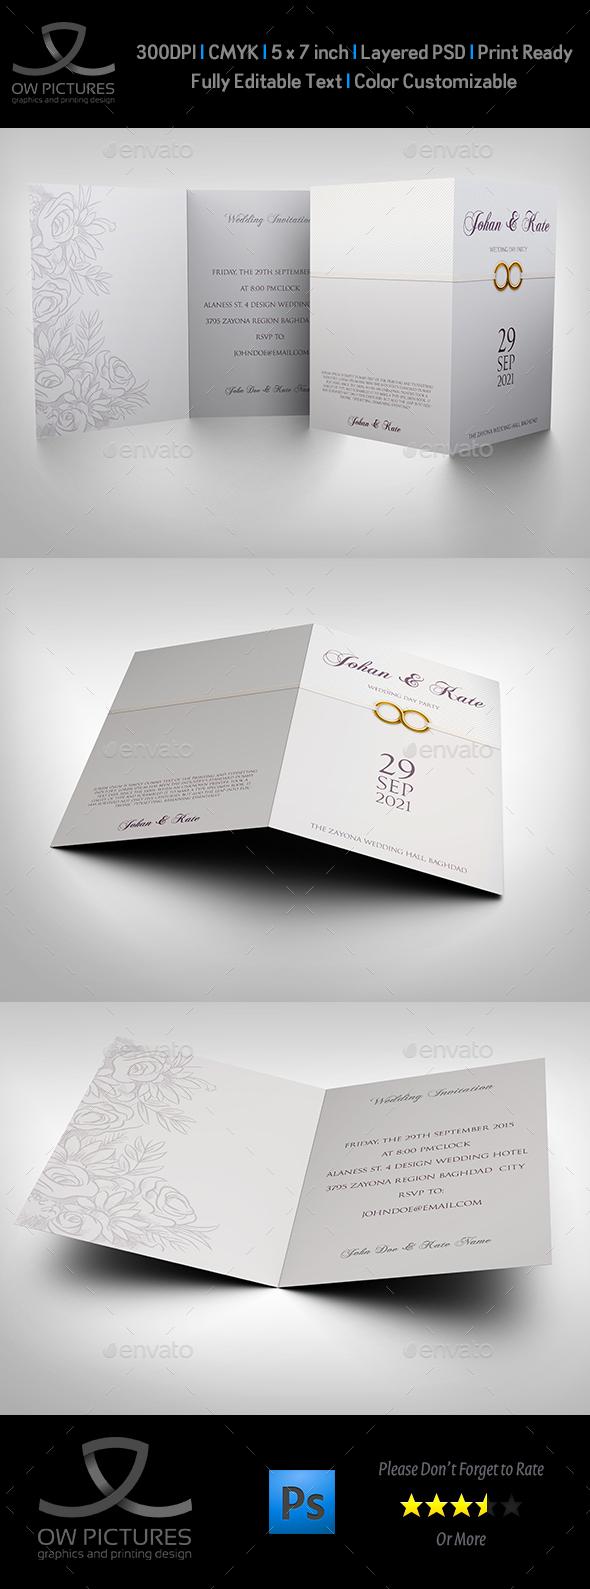 Wedding Invitation Card Template Vol.18 - Weddings Cards & Invites